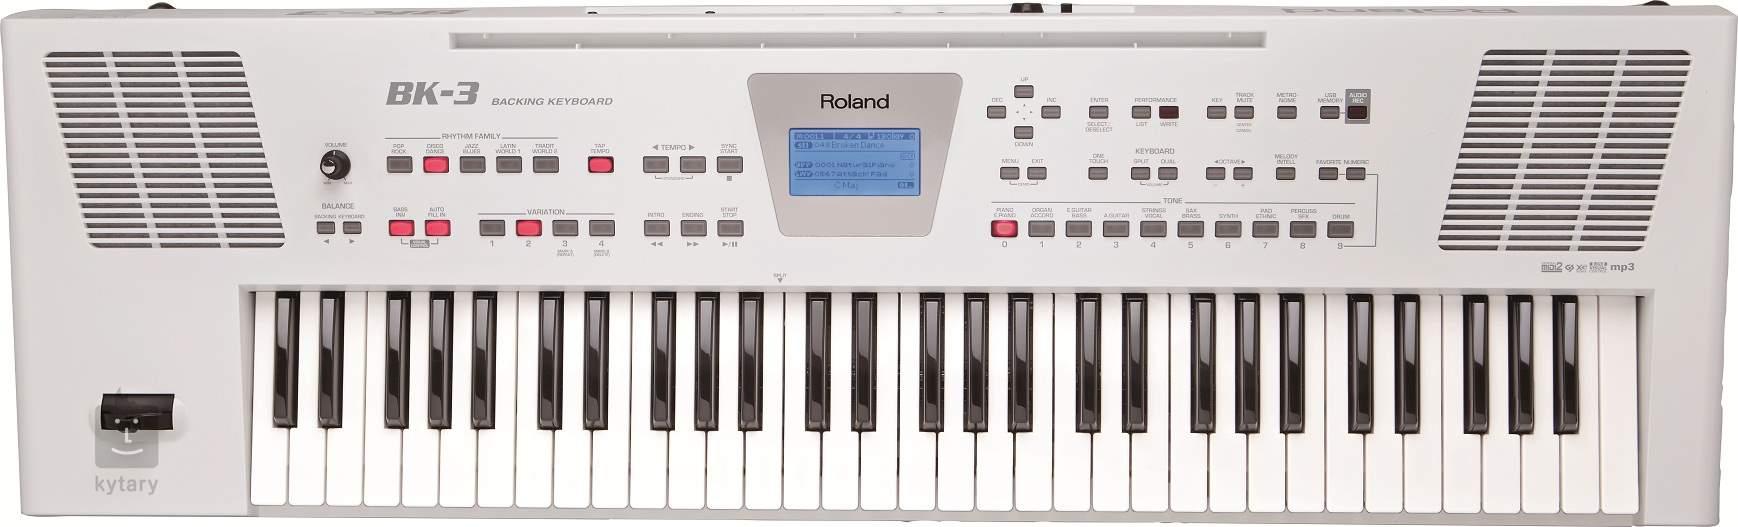 Roland Bk 5  Fabulous Roland Bk 5 With Roland Bk 5  Affordable